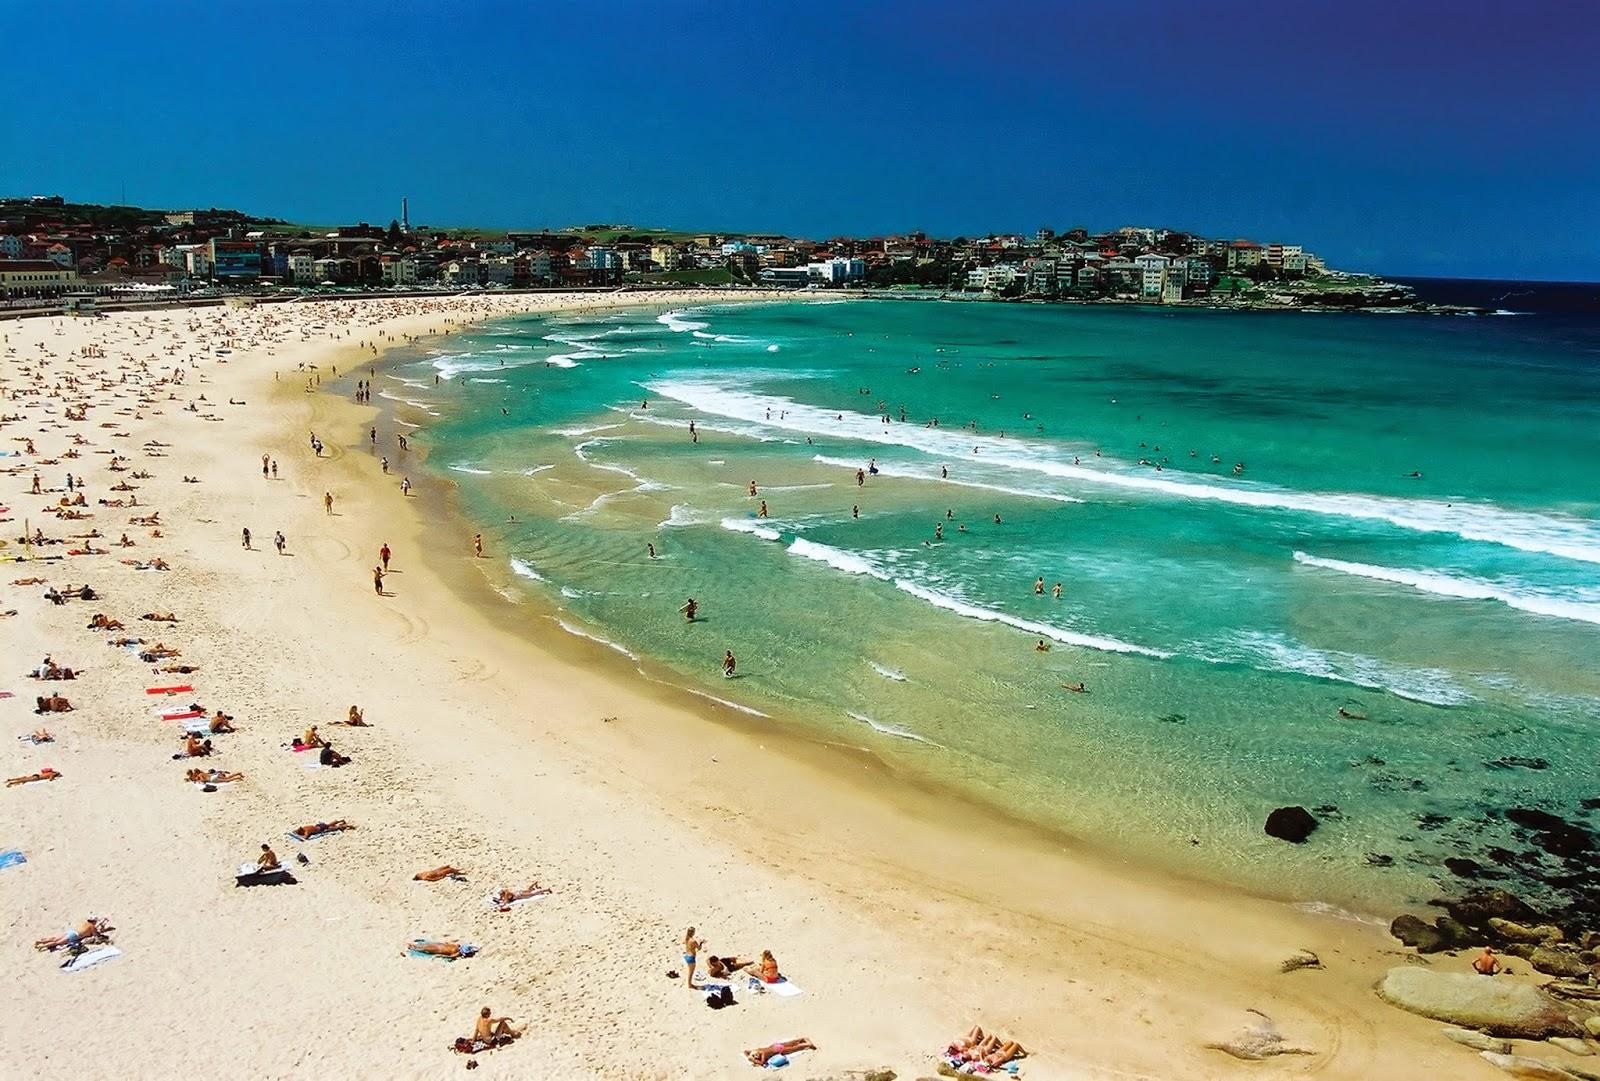 Австралия, Сидней, Bondi Beach